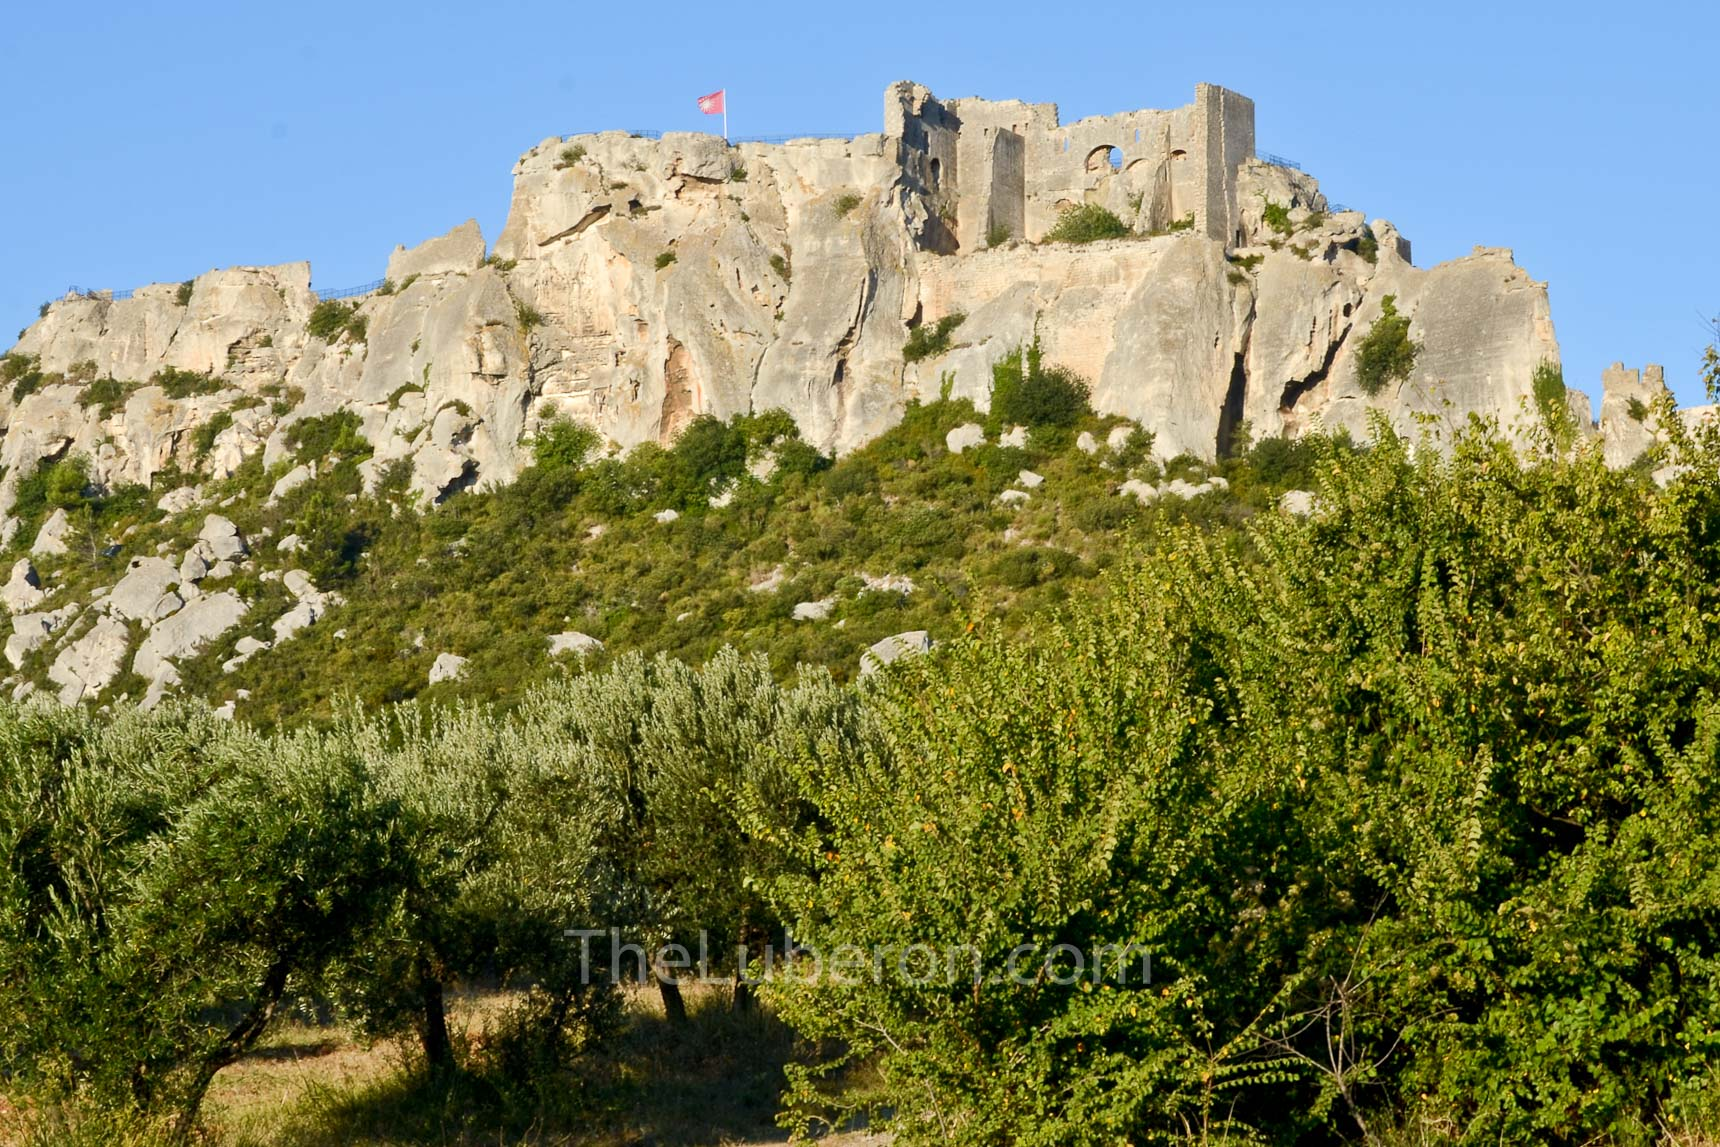 Looking up at Les Baux-de-Provence